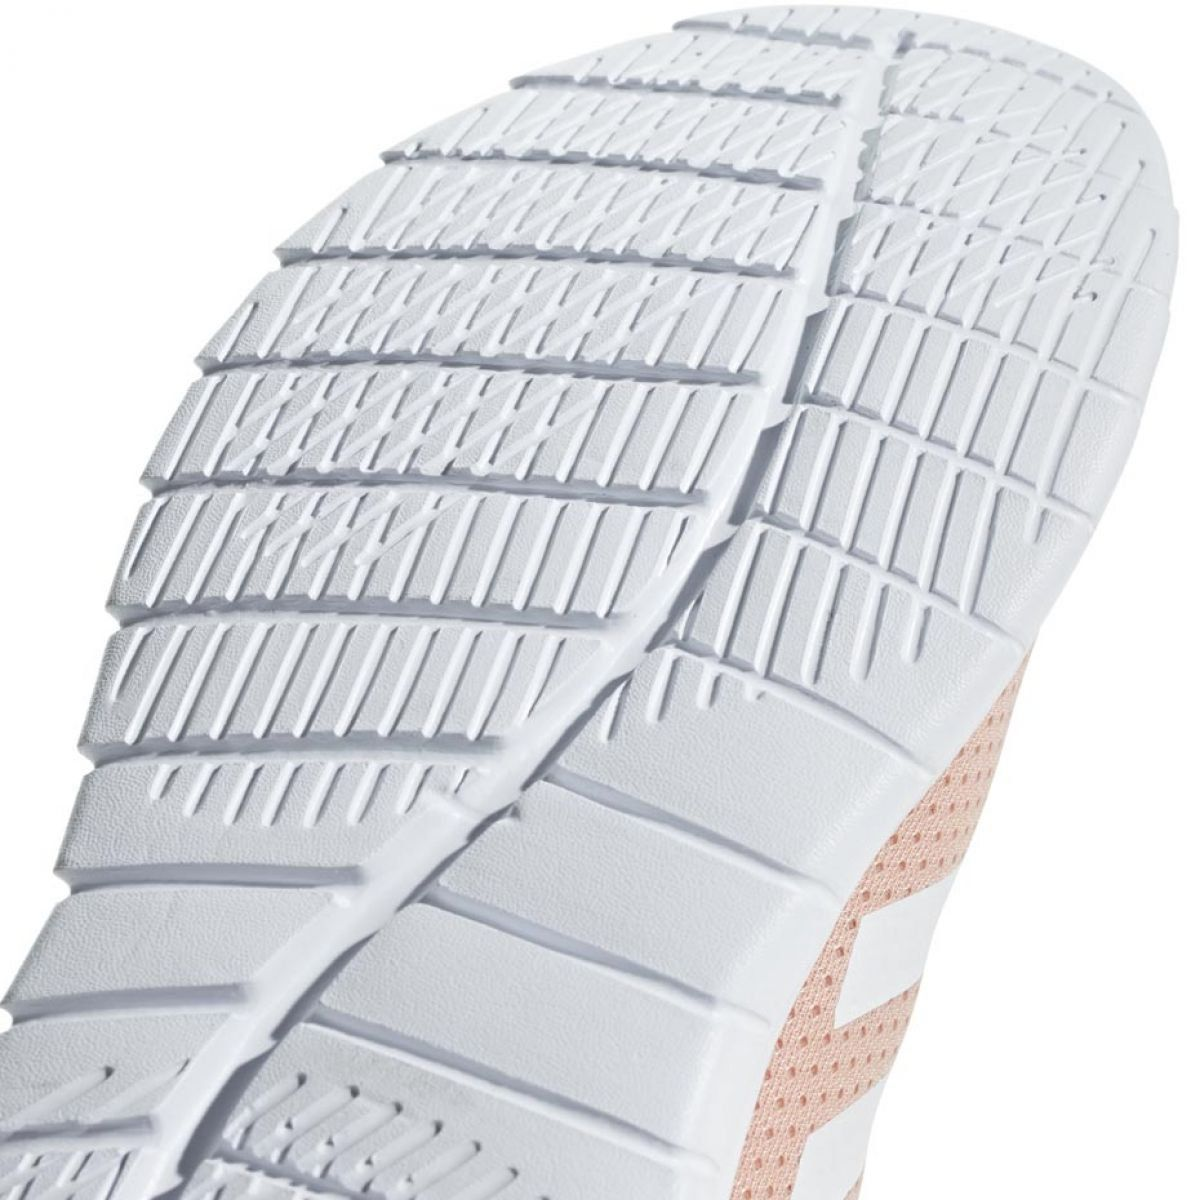 Buty Adidas Asweerun W F36733 Rozowe Adidas Shoes Women Adidas Adidas Women